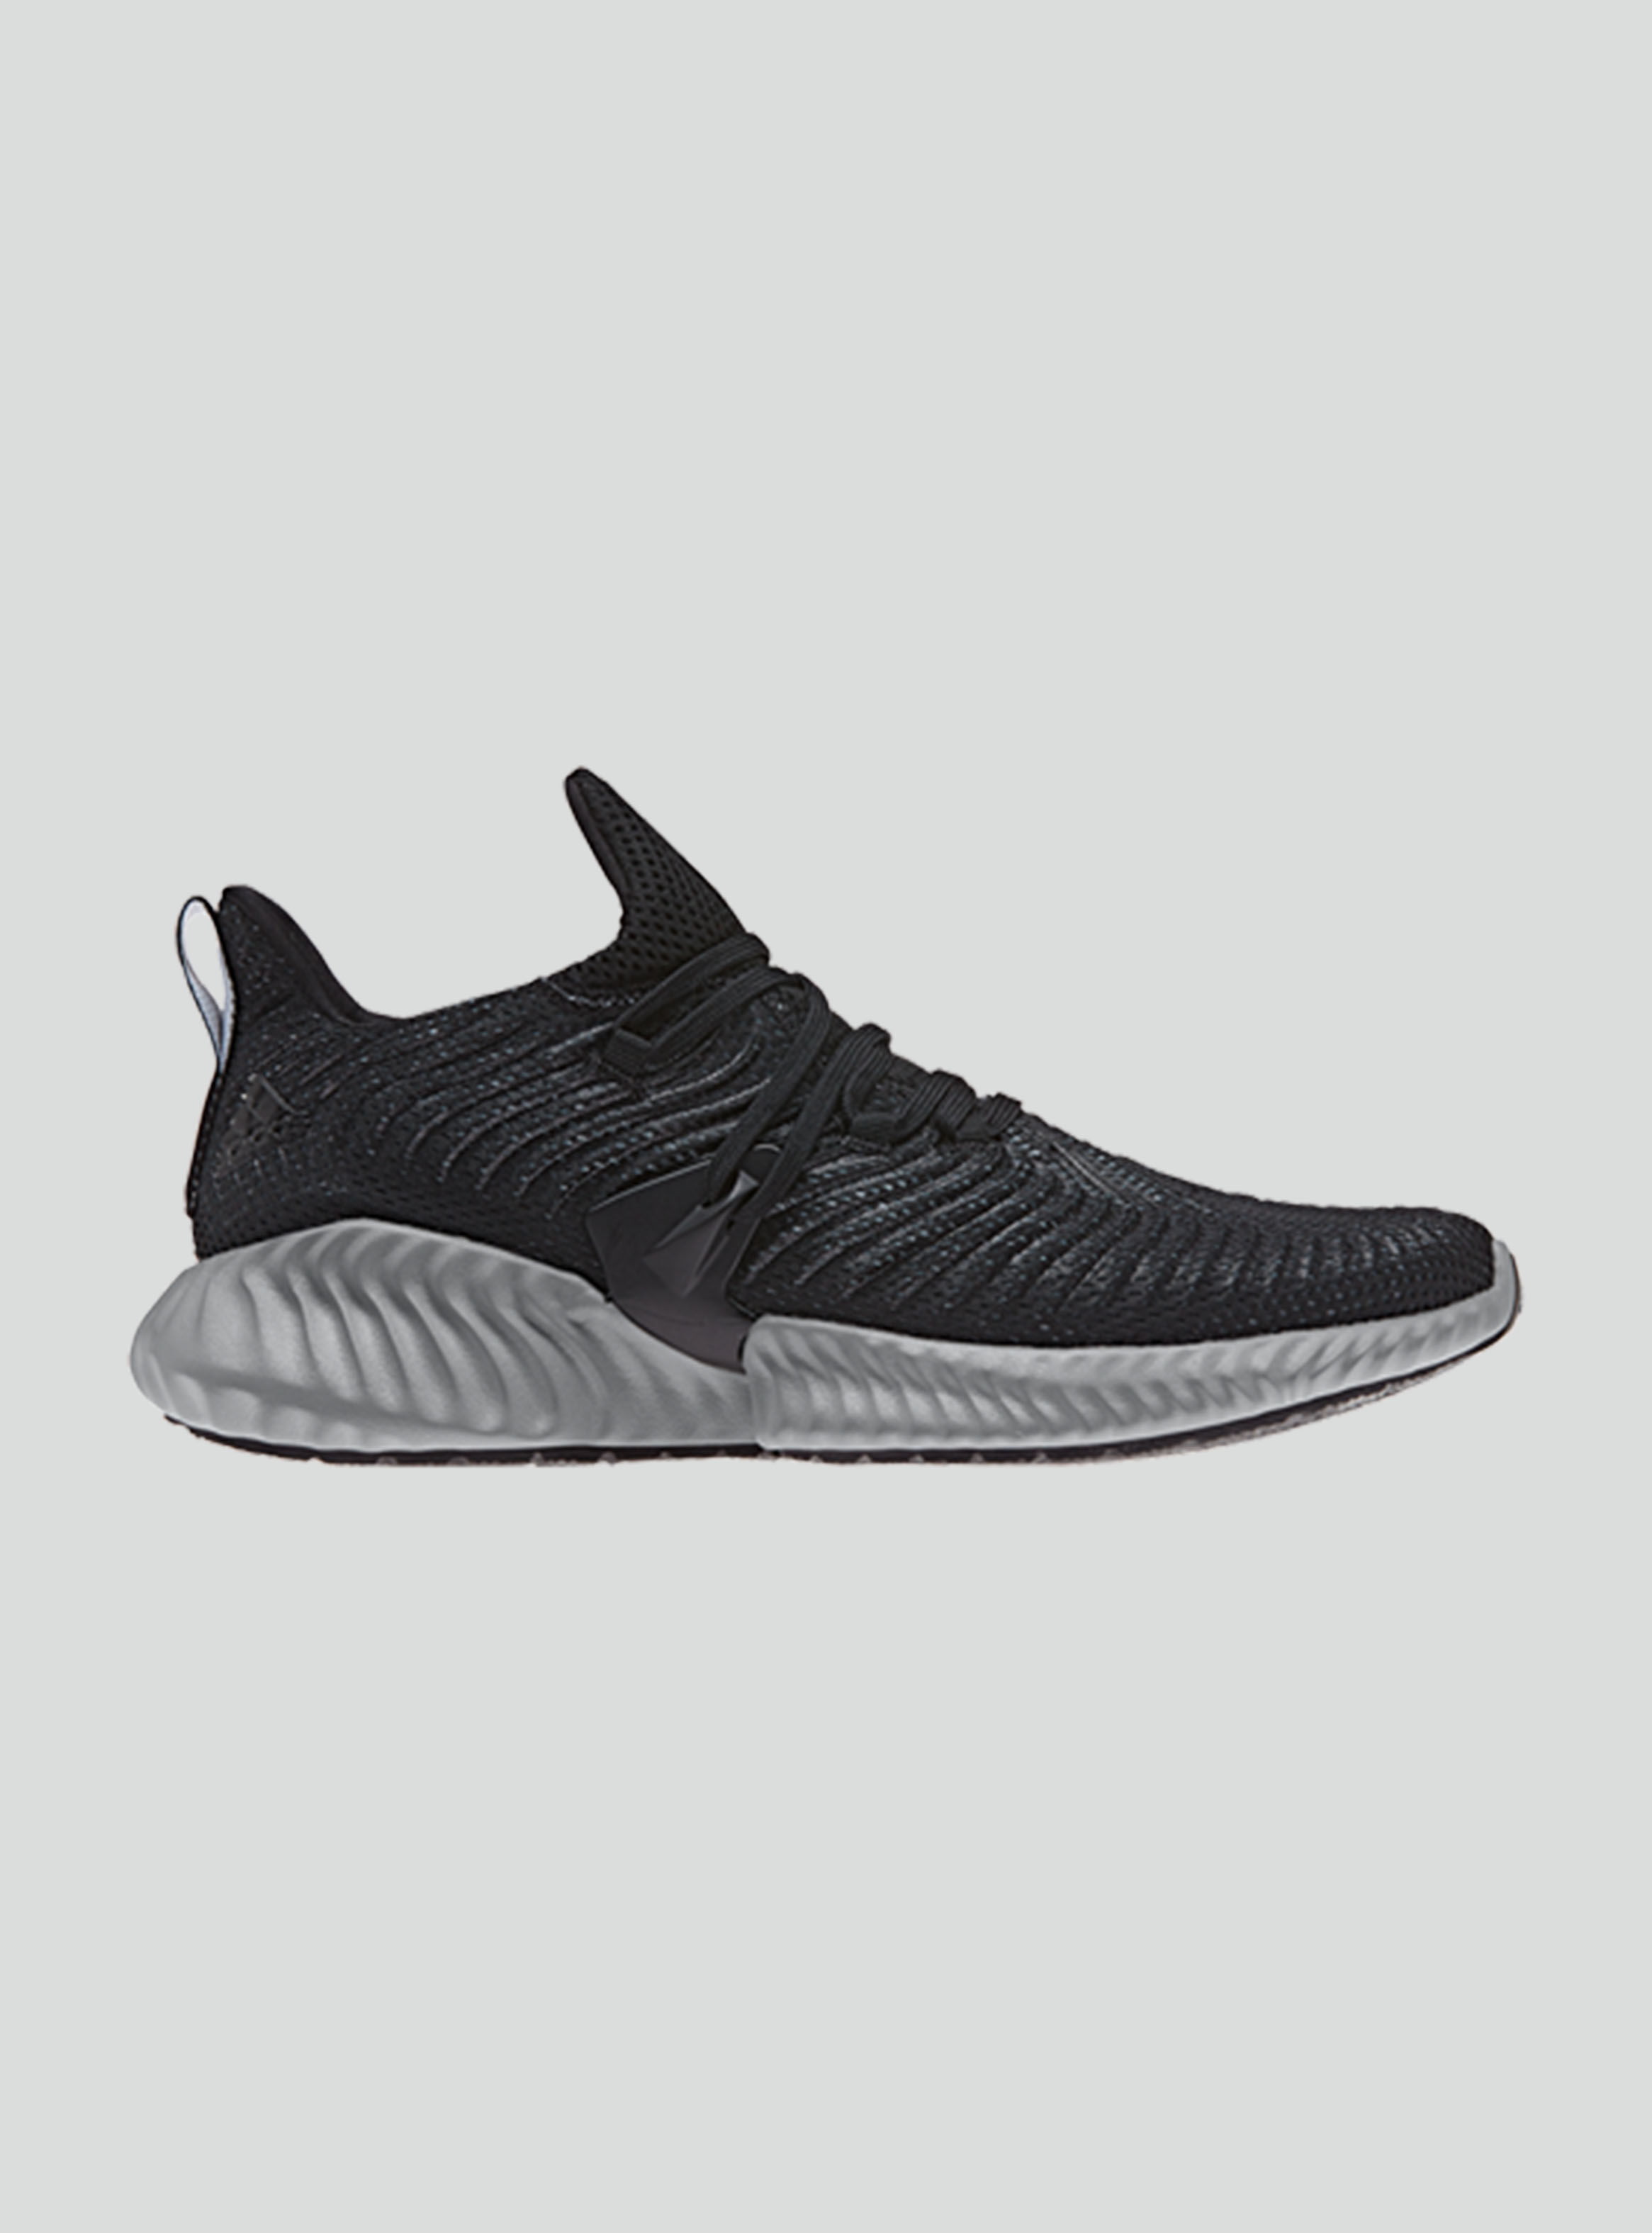 Negro Adidas 36 Cero Trainer Talla única